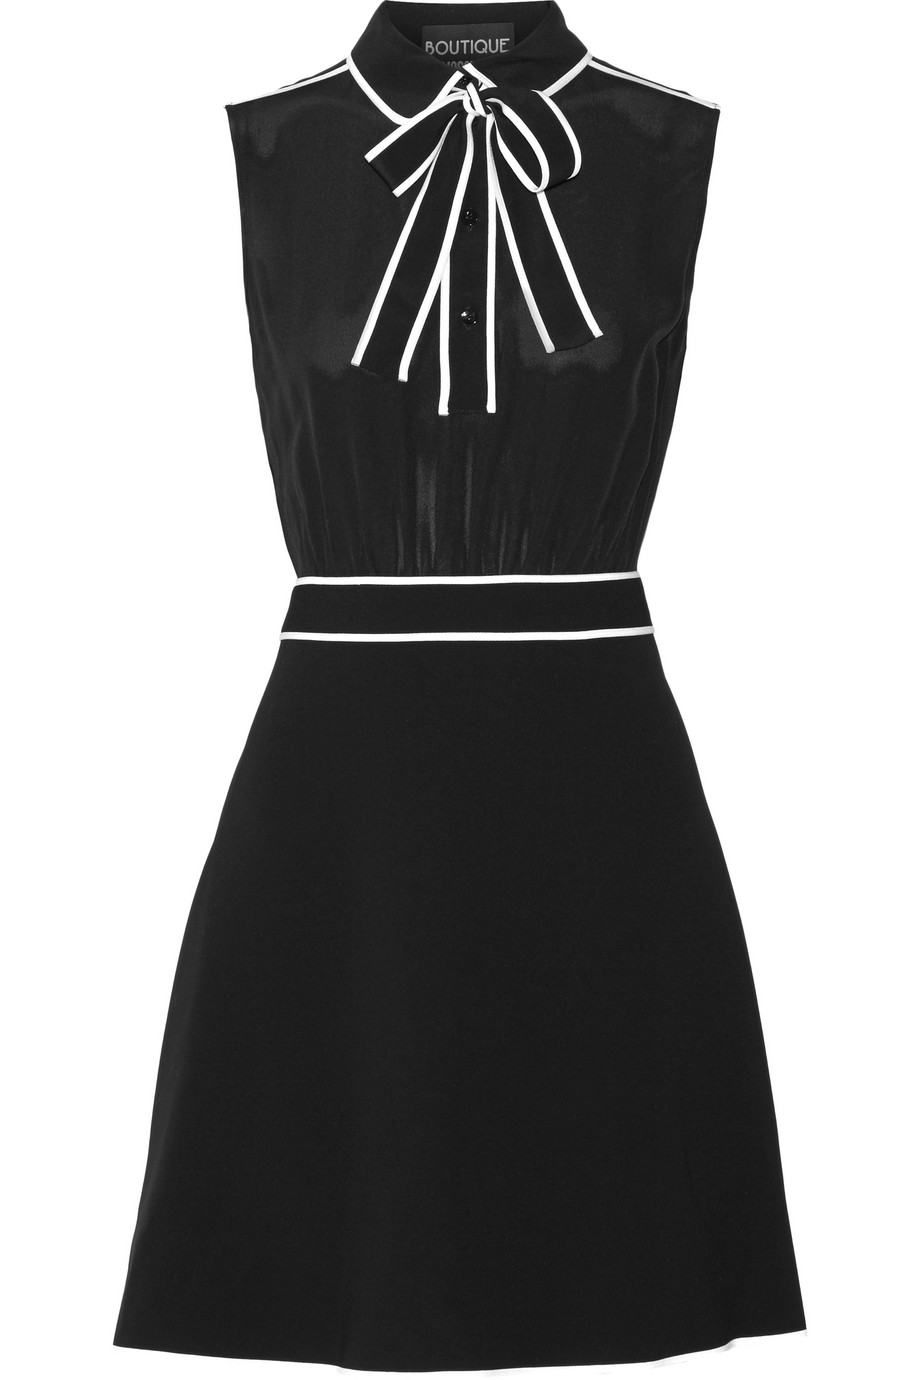 Pussy-Bow Silk-Chiffon and Stretch-Crepe Mini Dress, Black, Women's, Size: 40